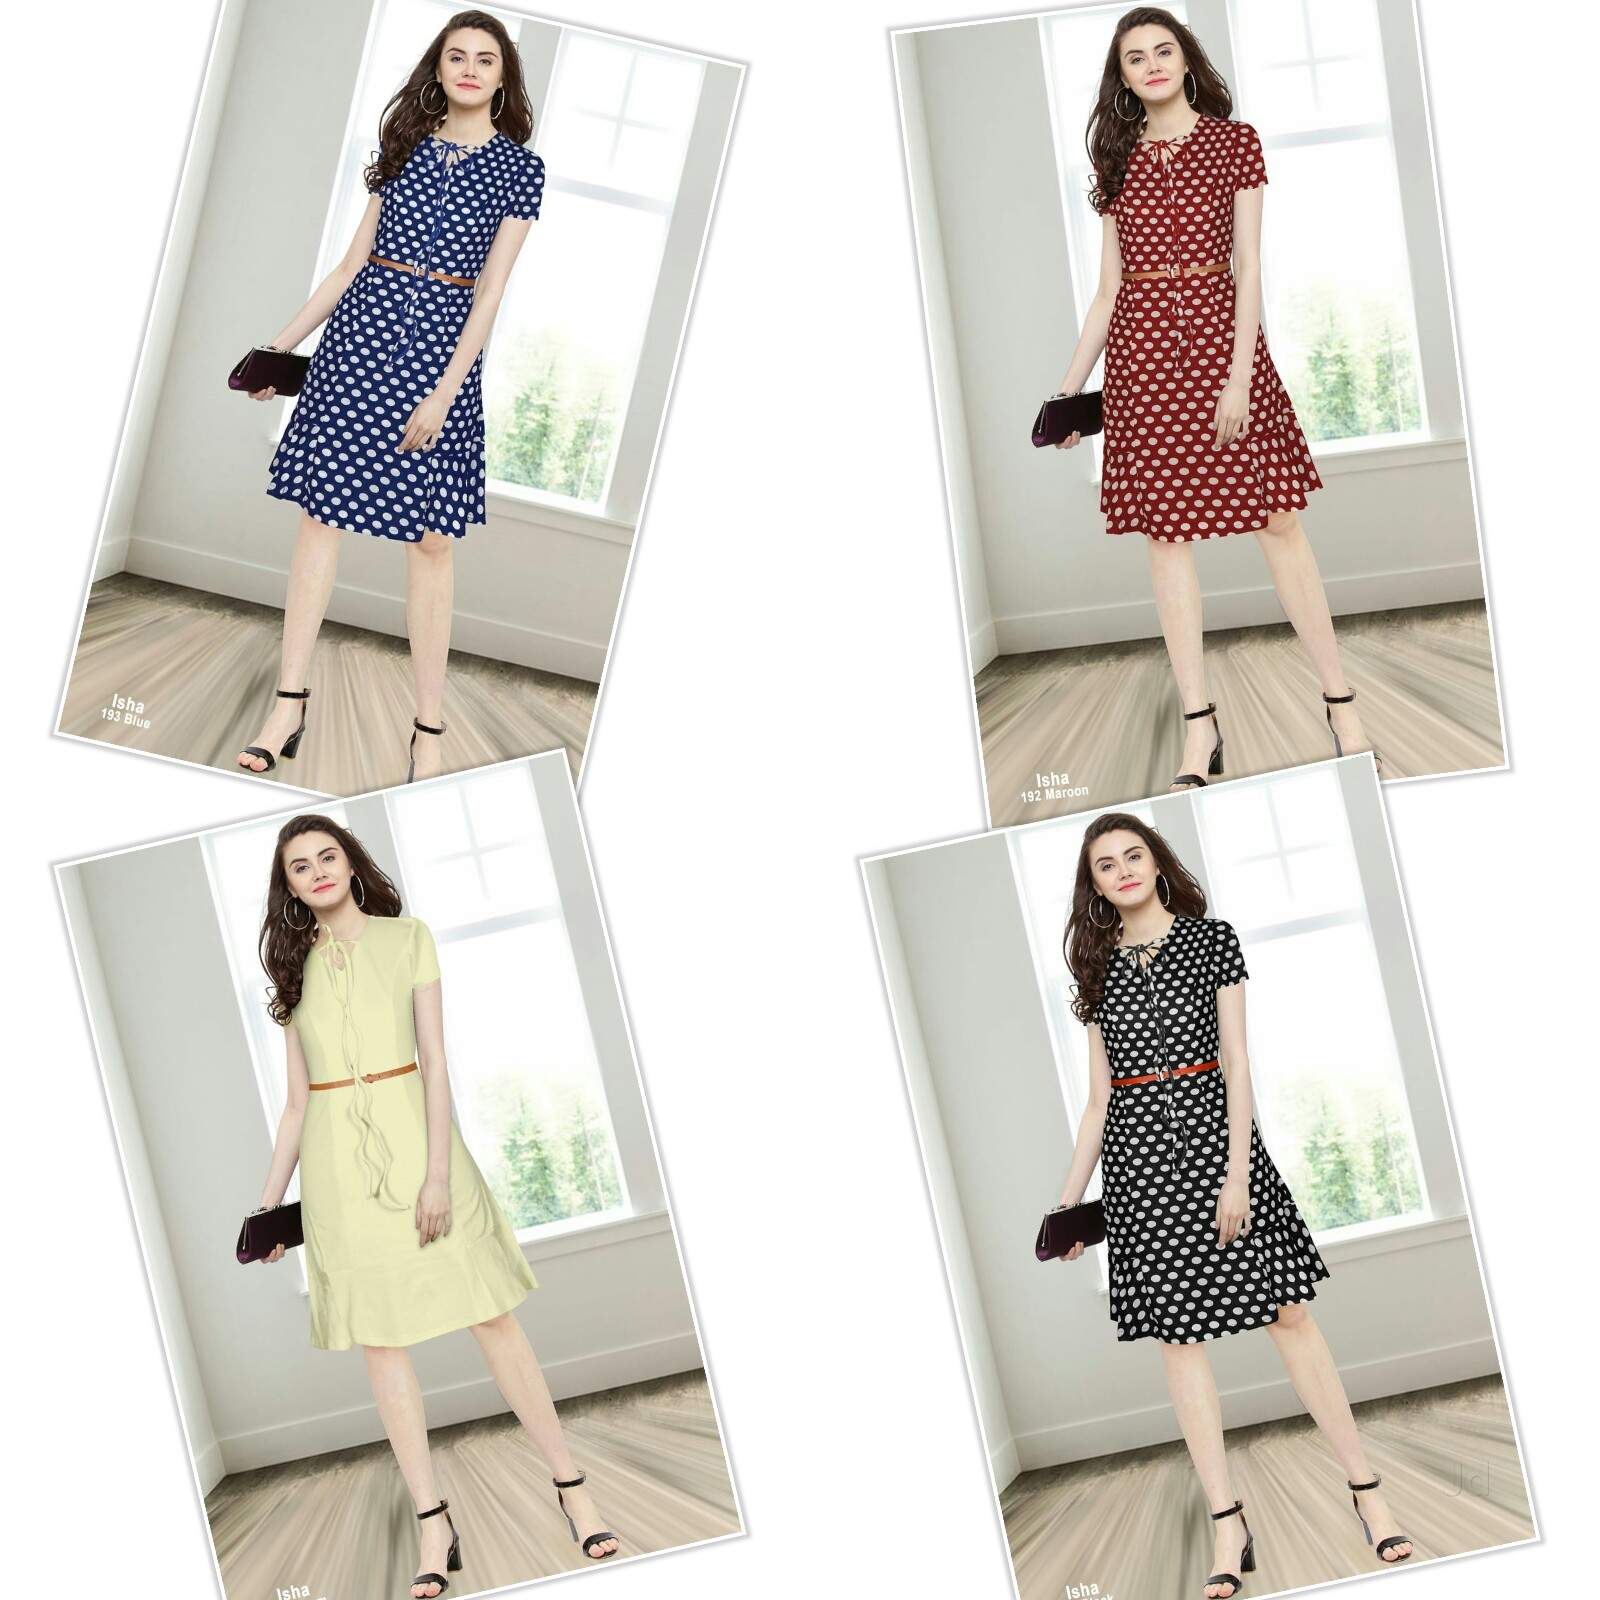 c69a95369ef Top 100 Women Western Garment Wholesalers in Malad West - Best ...